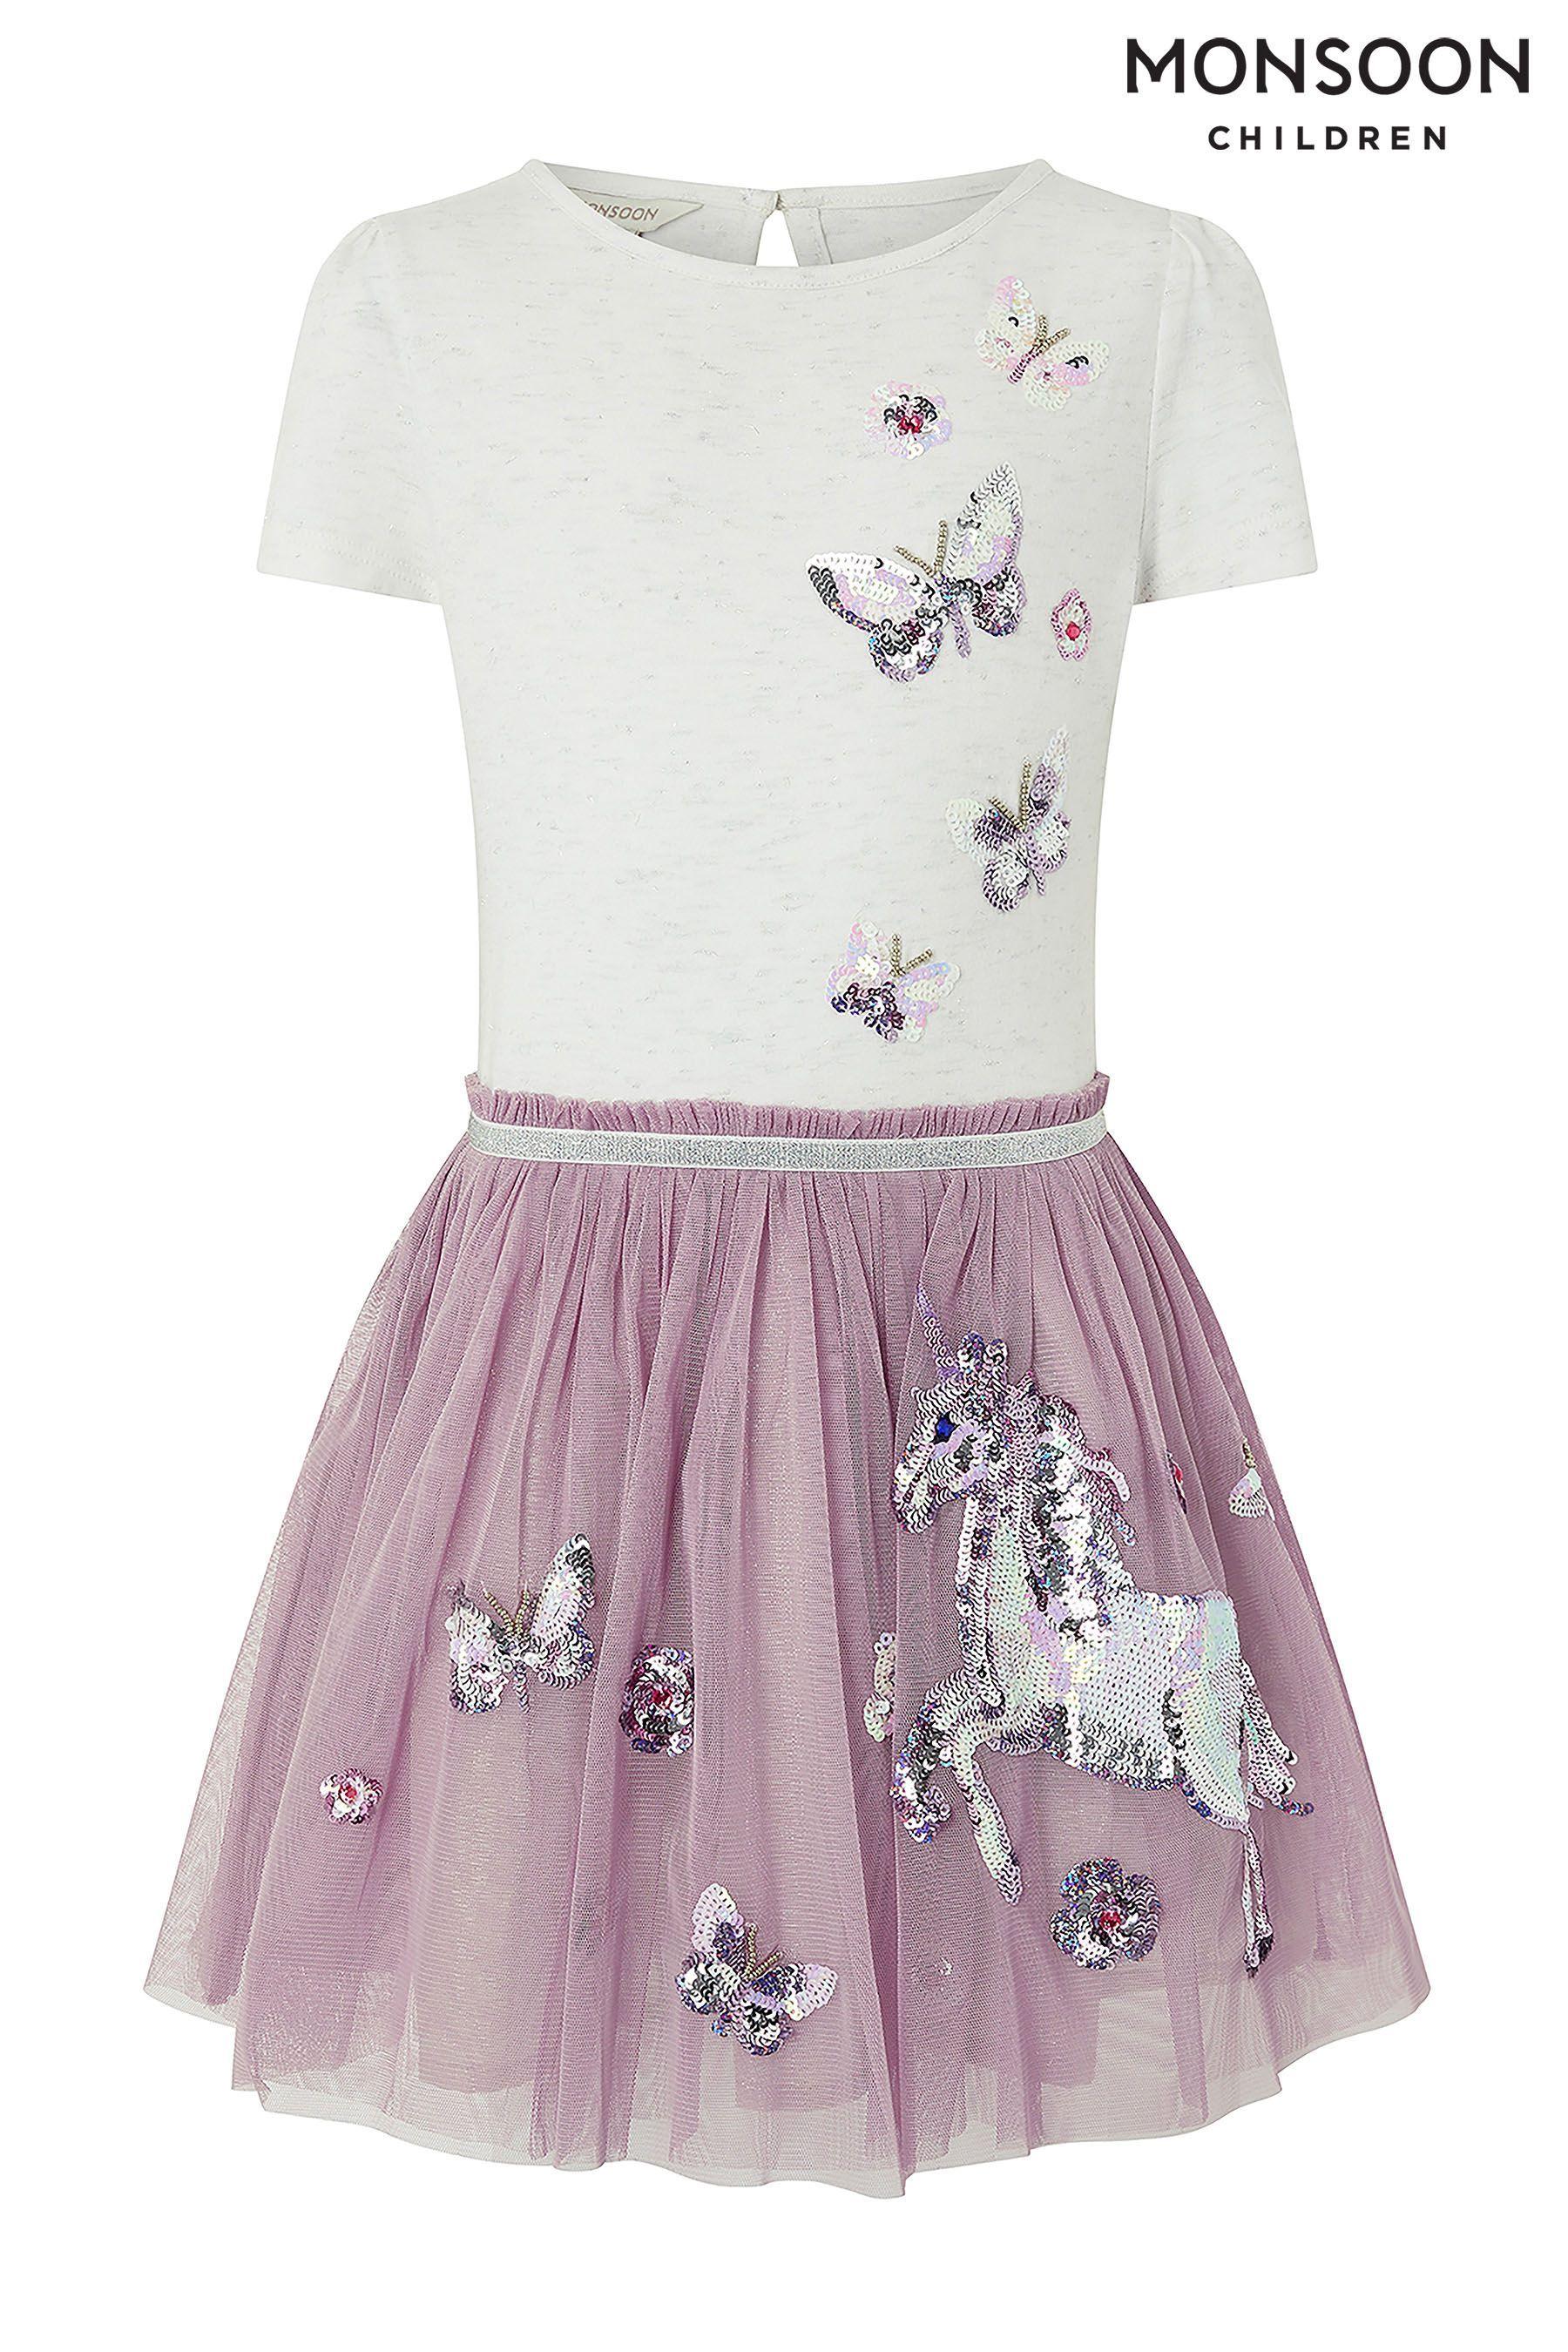 9134530edcd9 Girls Monsoon Disco Unicorn Dress - Purple   Products   Unicorn ...